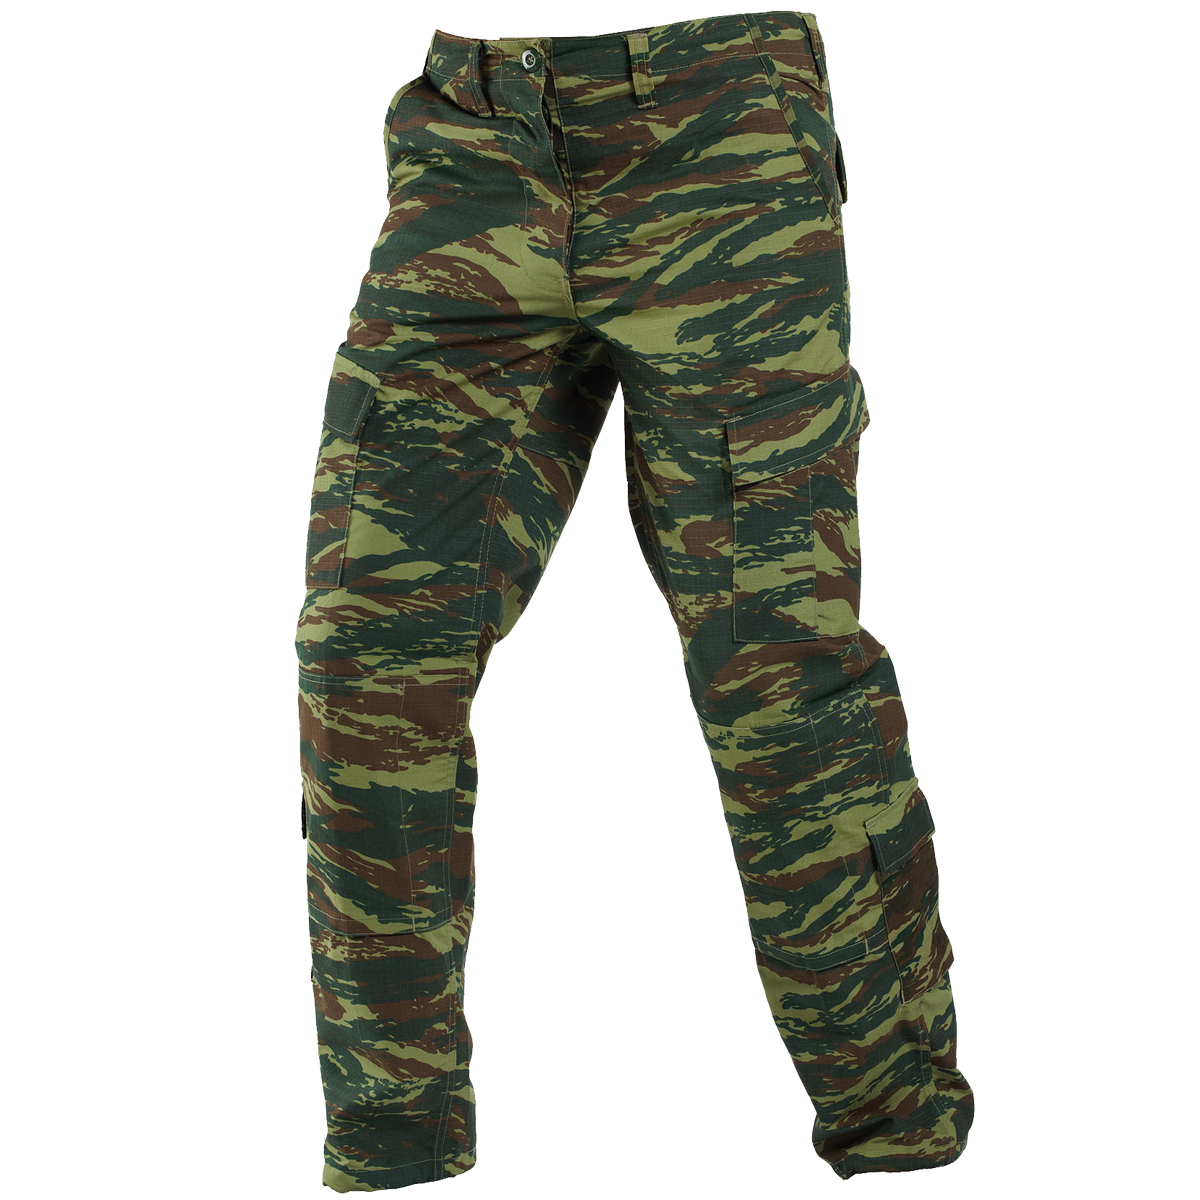 Pentagon Acu Combat Pants Greek Lizard Acu Military 1st